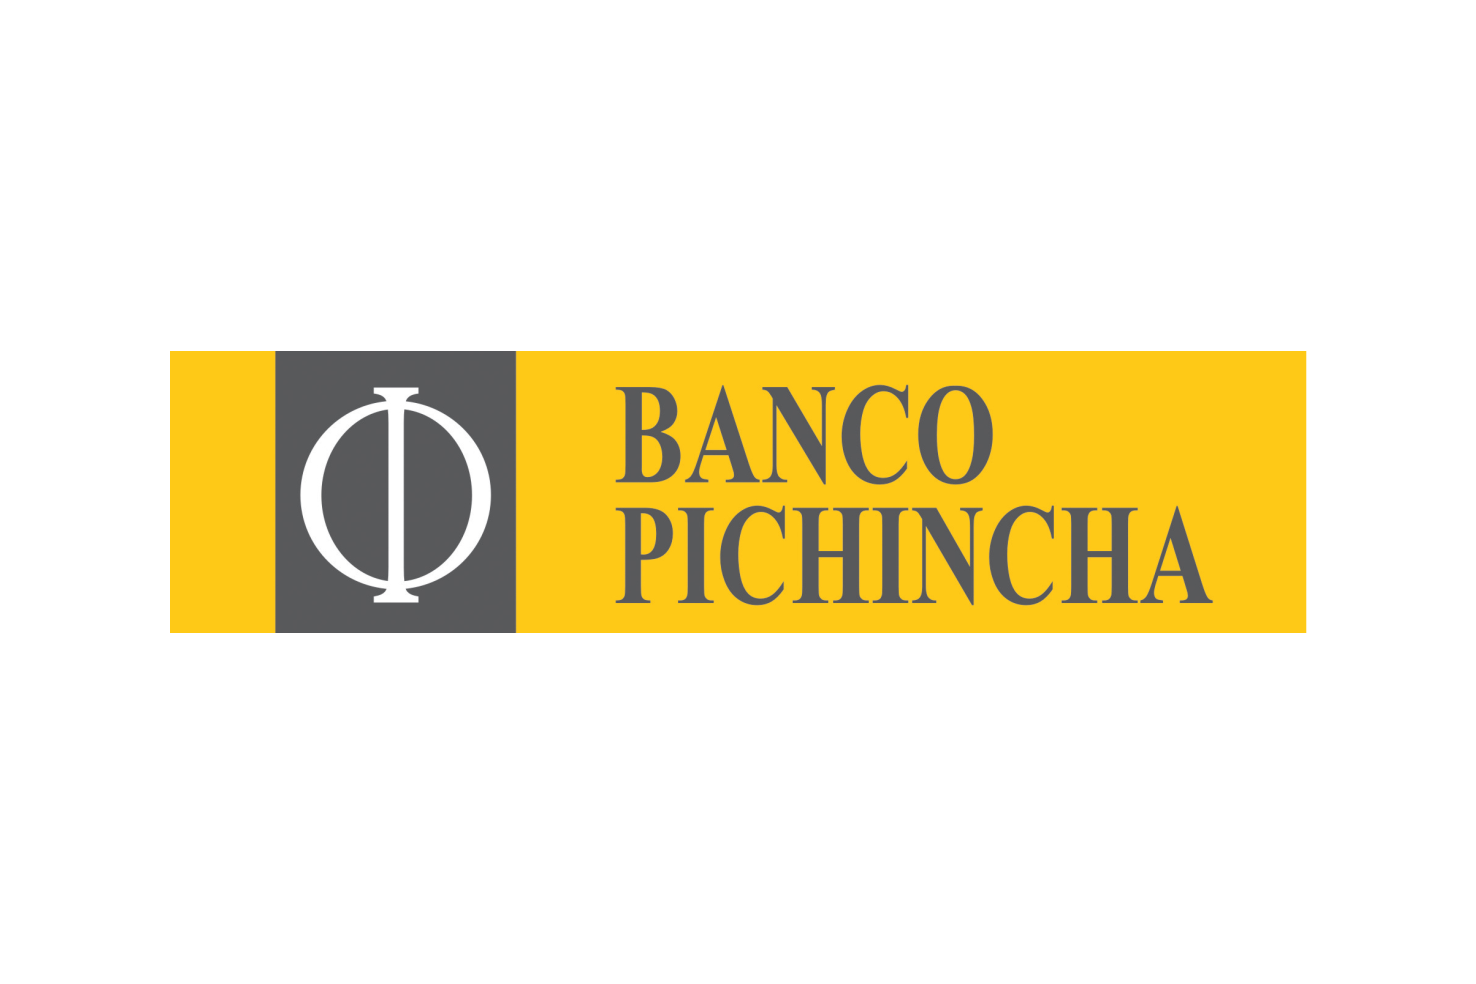 pichincha logo servicio al cliente